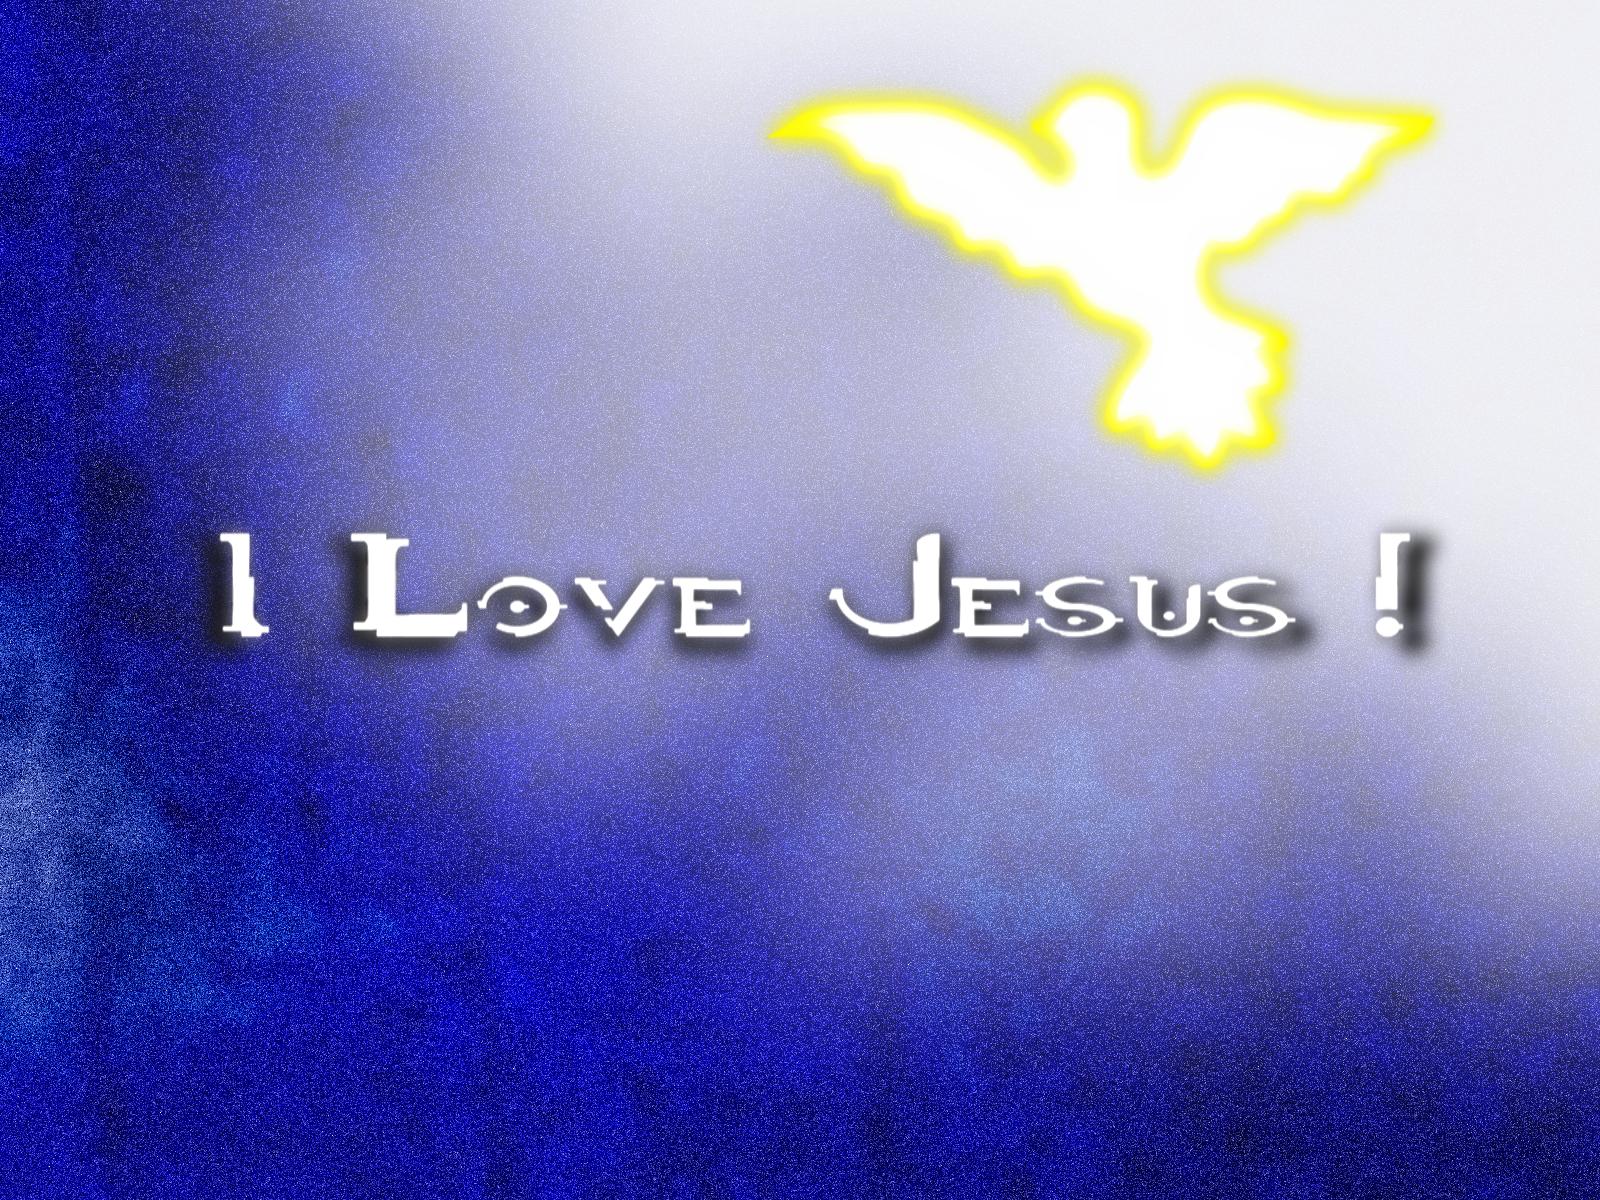 i love hd wallpaper I Love Jesus Wallpaper 1600x1200